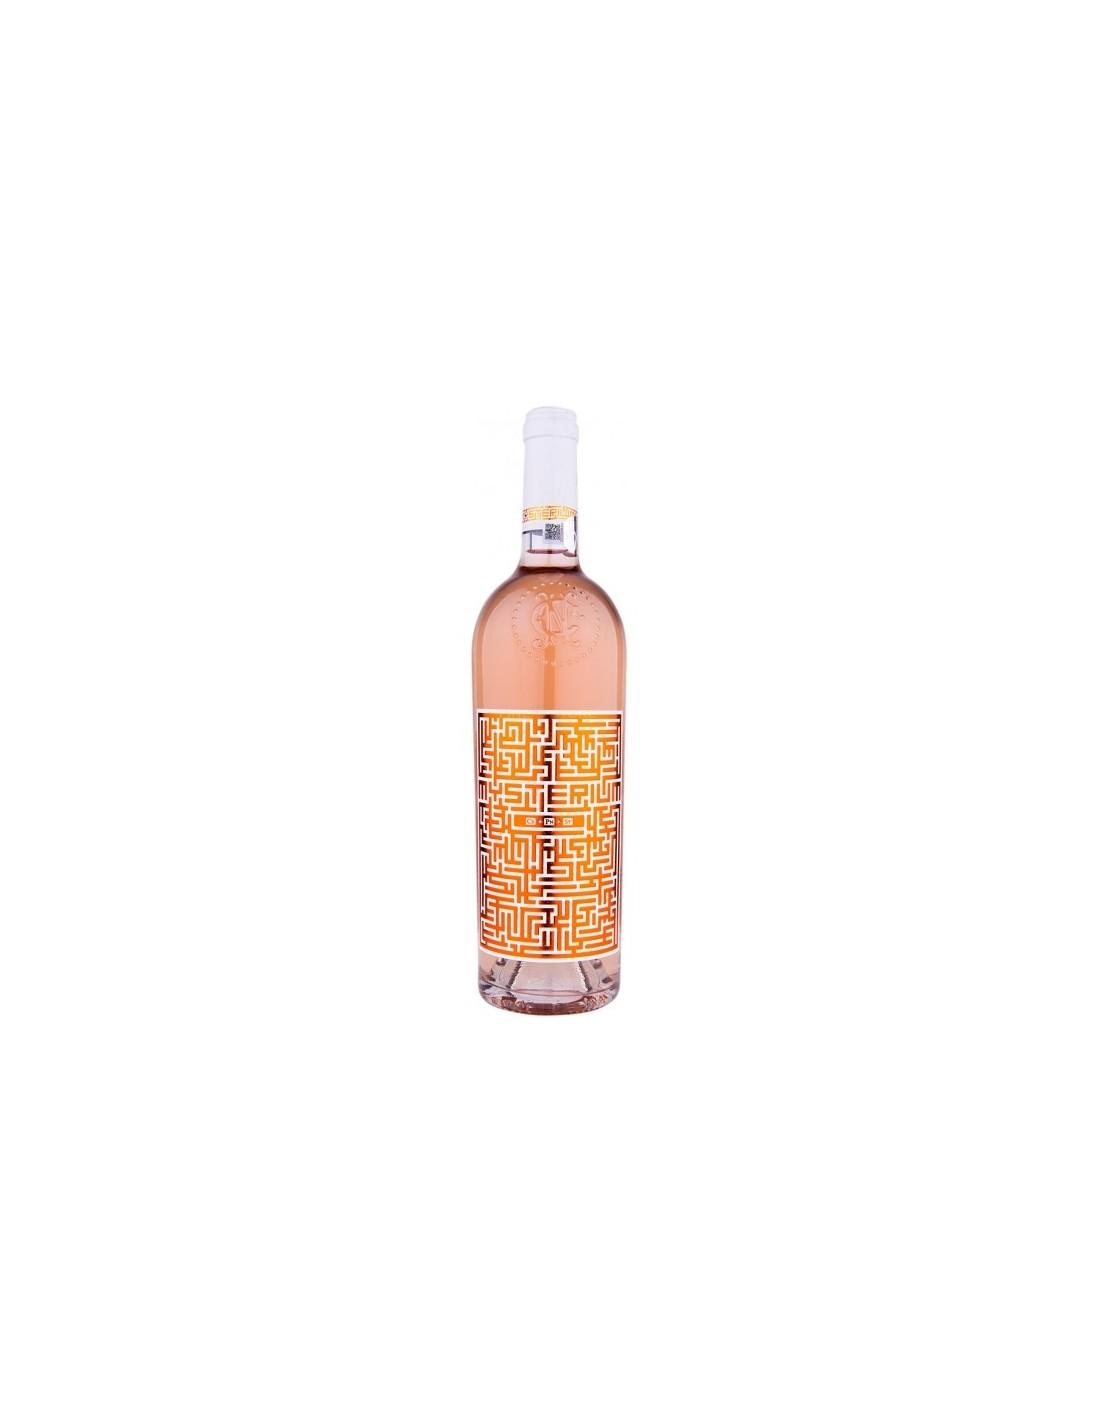 Vin roze, Cupaj, Jidvei Mysterium Tarnave, 0.75L, 12.5% alc., Romania